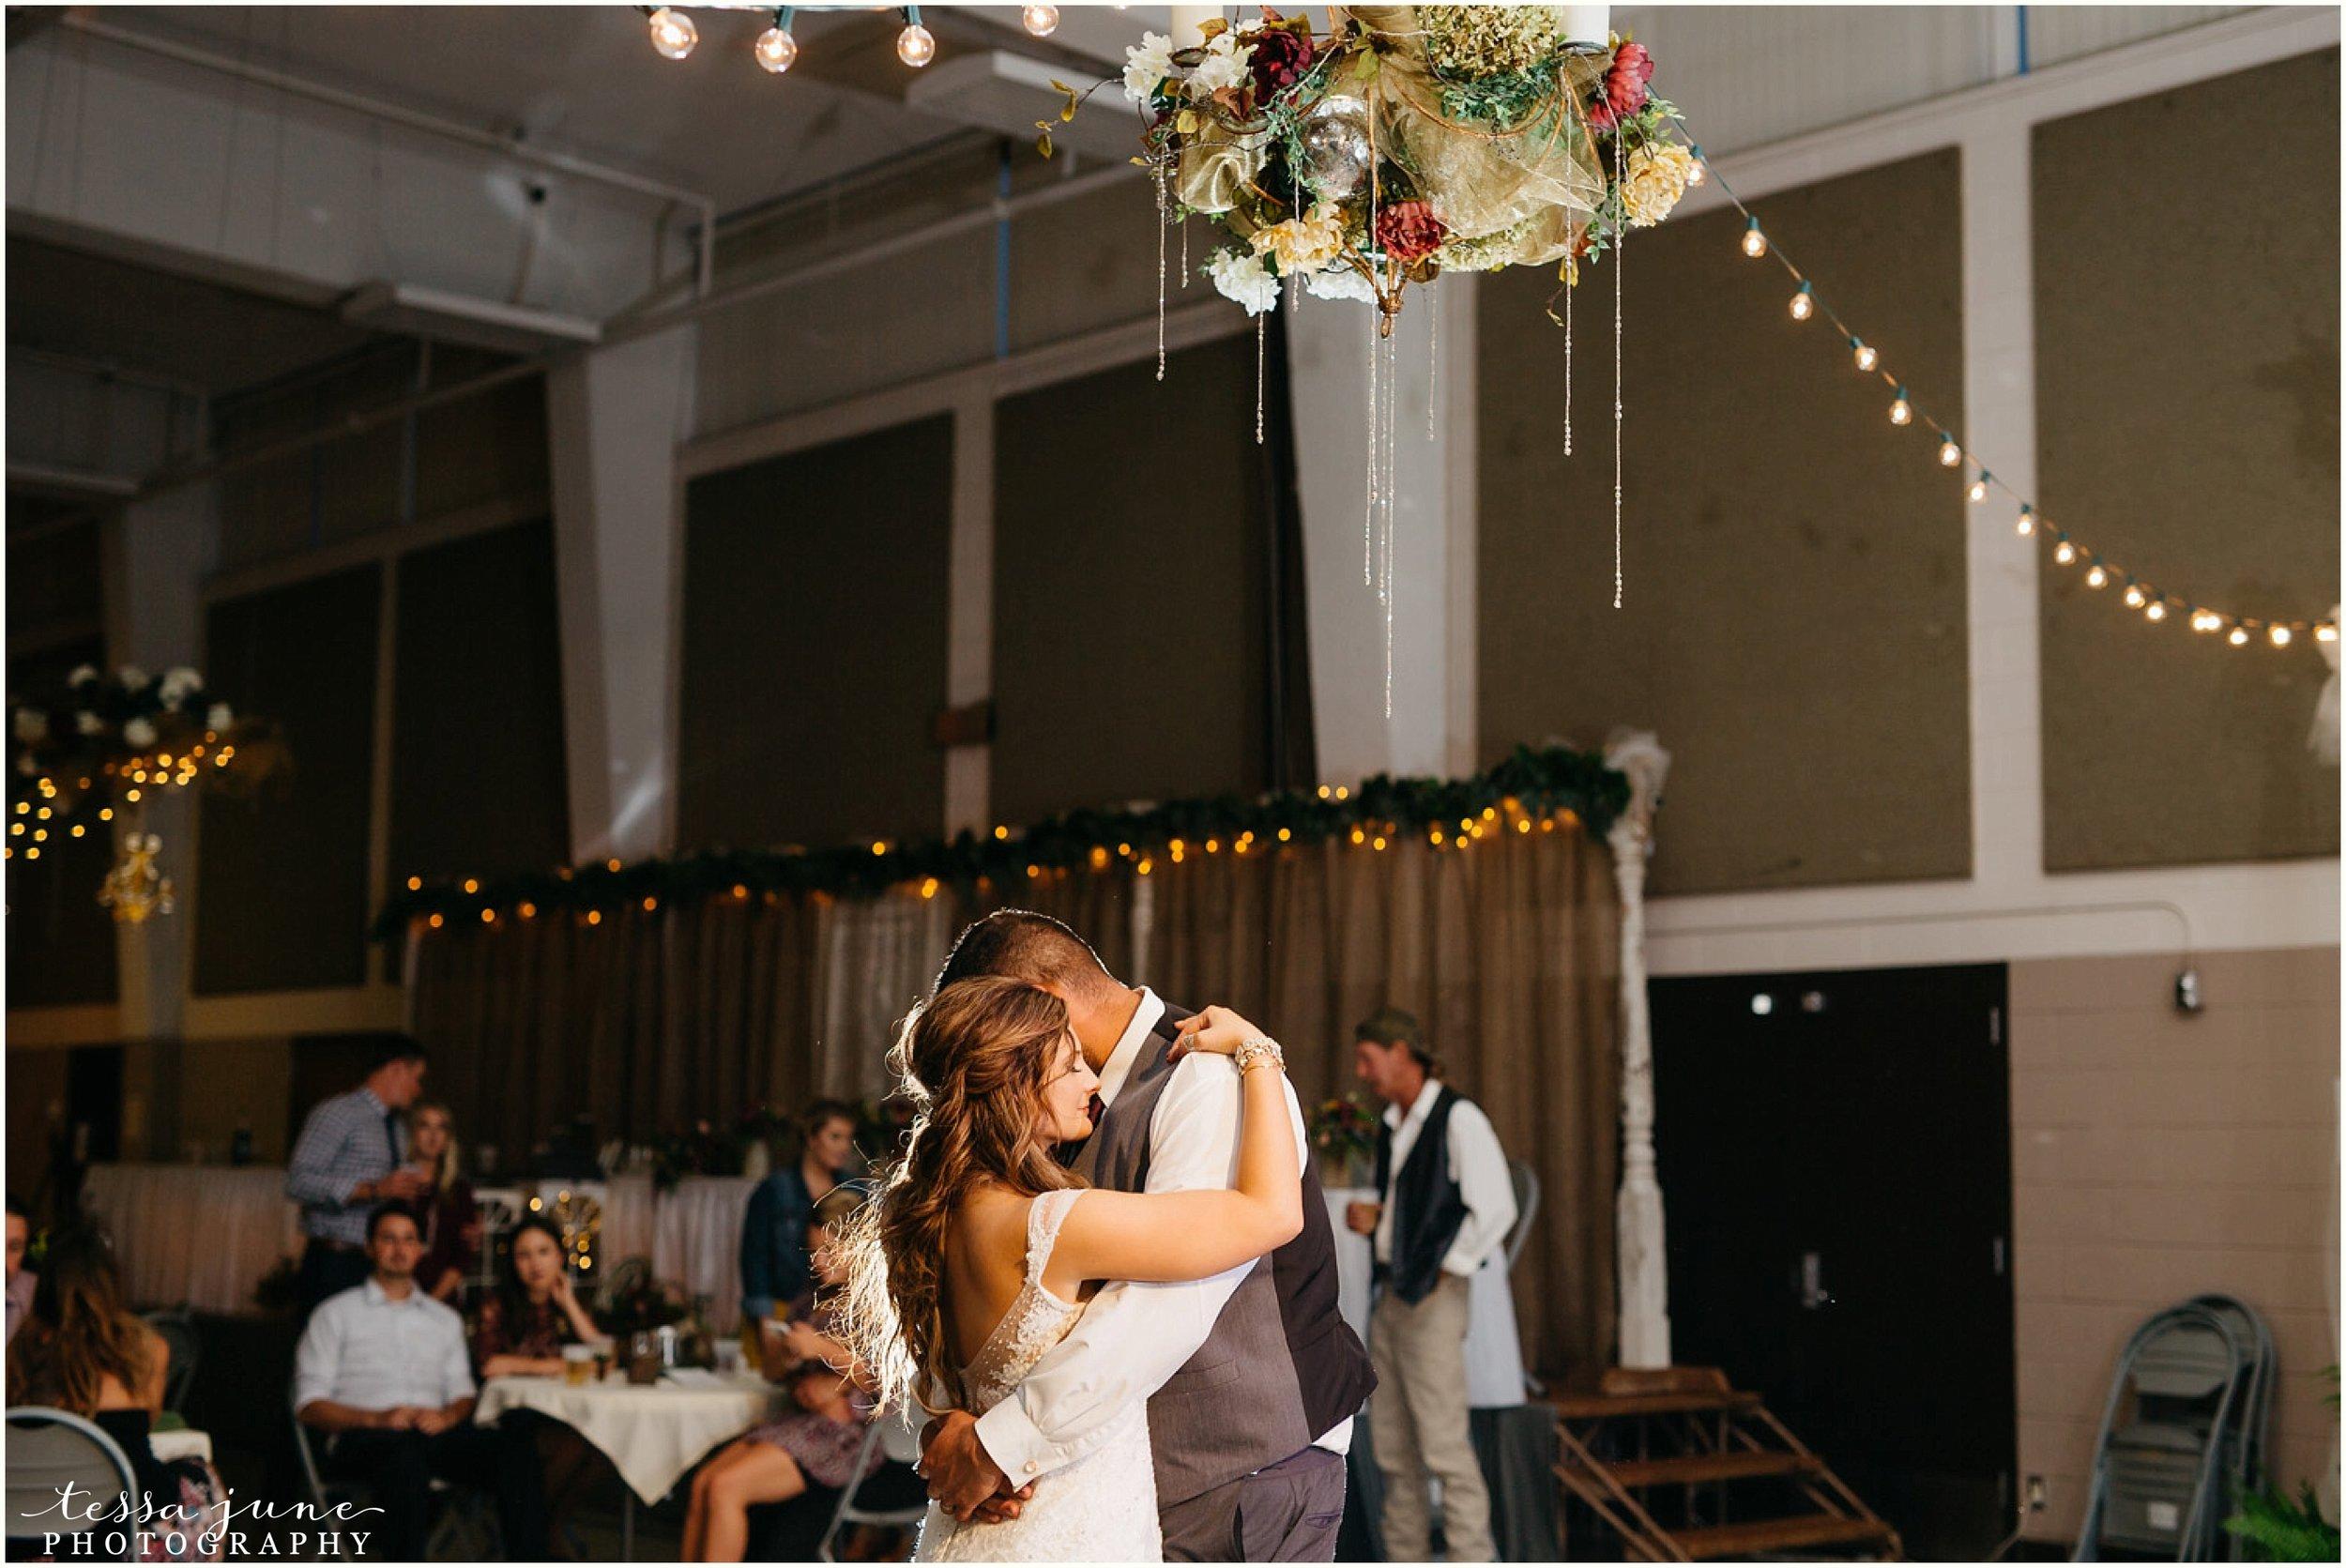 bohemian-minnesota-wedding-mismatched-bridesmaid-dresses-waterfall-st-cloud-tessa-june-photography-190.jpg